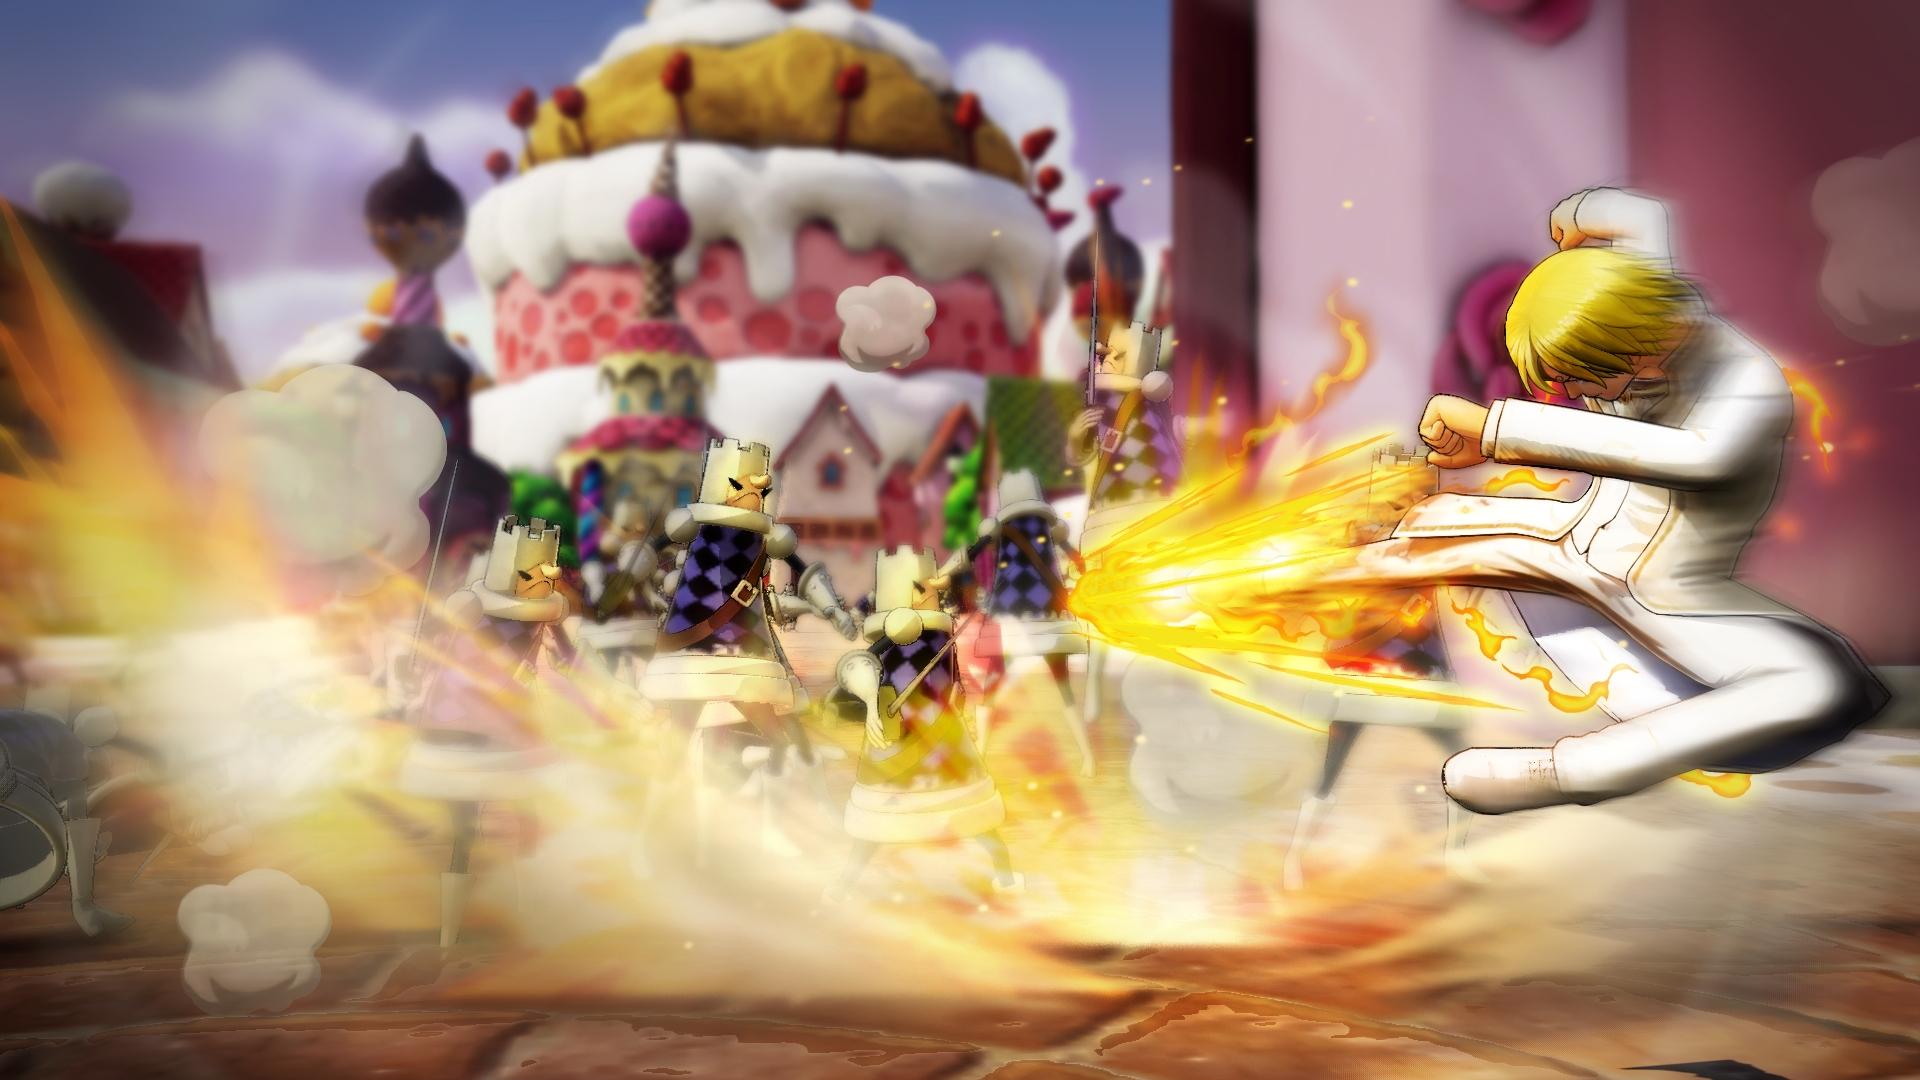 GC 2019:《海贼无双4》中文版实机预告首曝 大量新截图公开